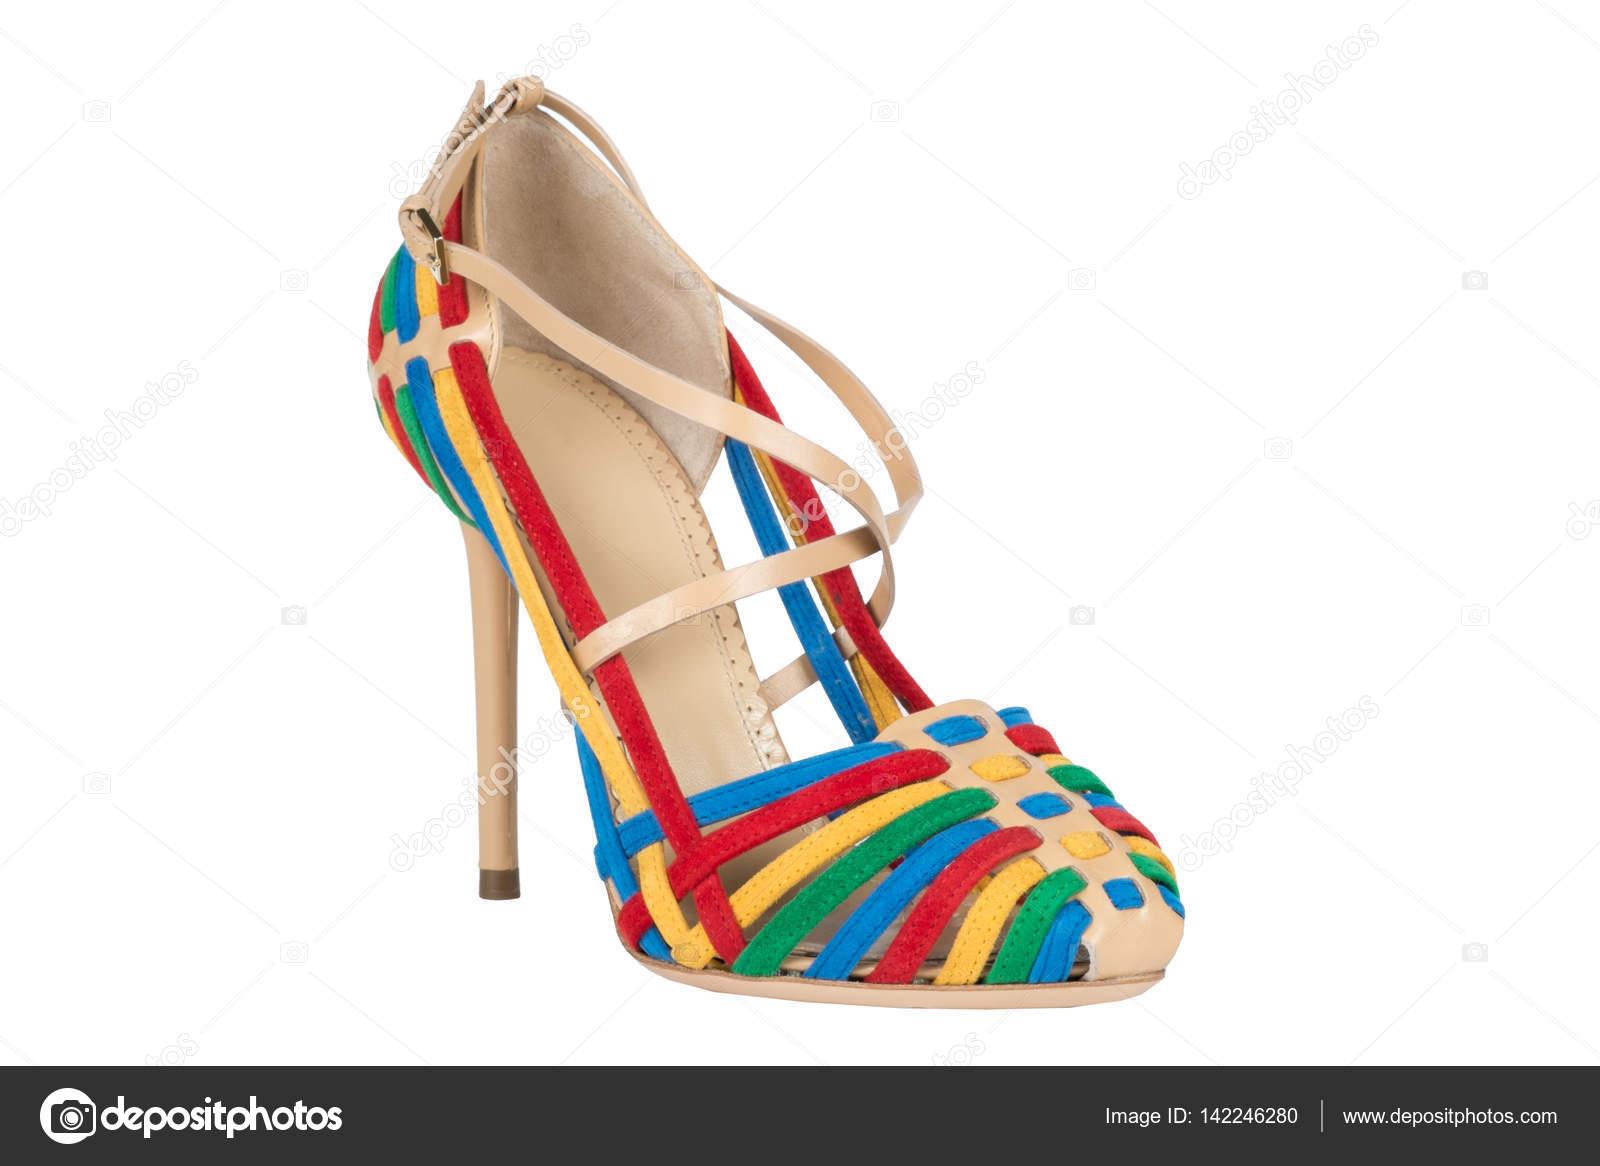 7f139844 Zapatos. Zapatos de mujer sobre un fondo blanco. calzado Premium. Zapatos  italianos marca